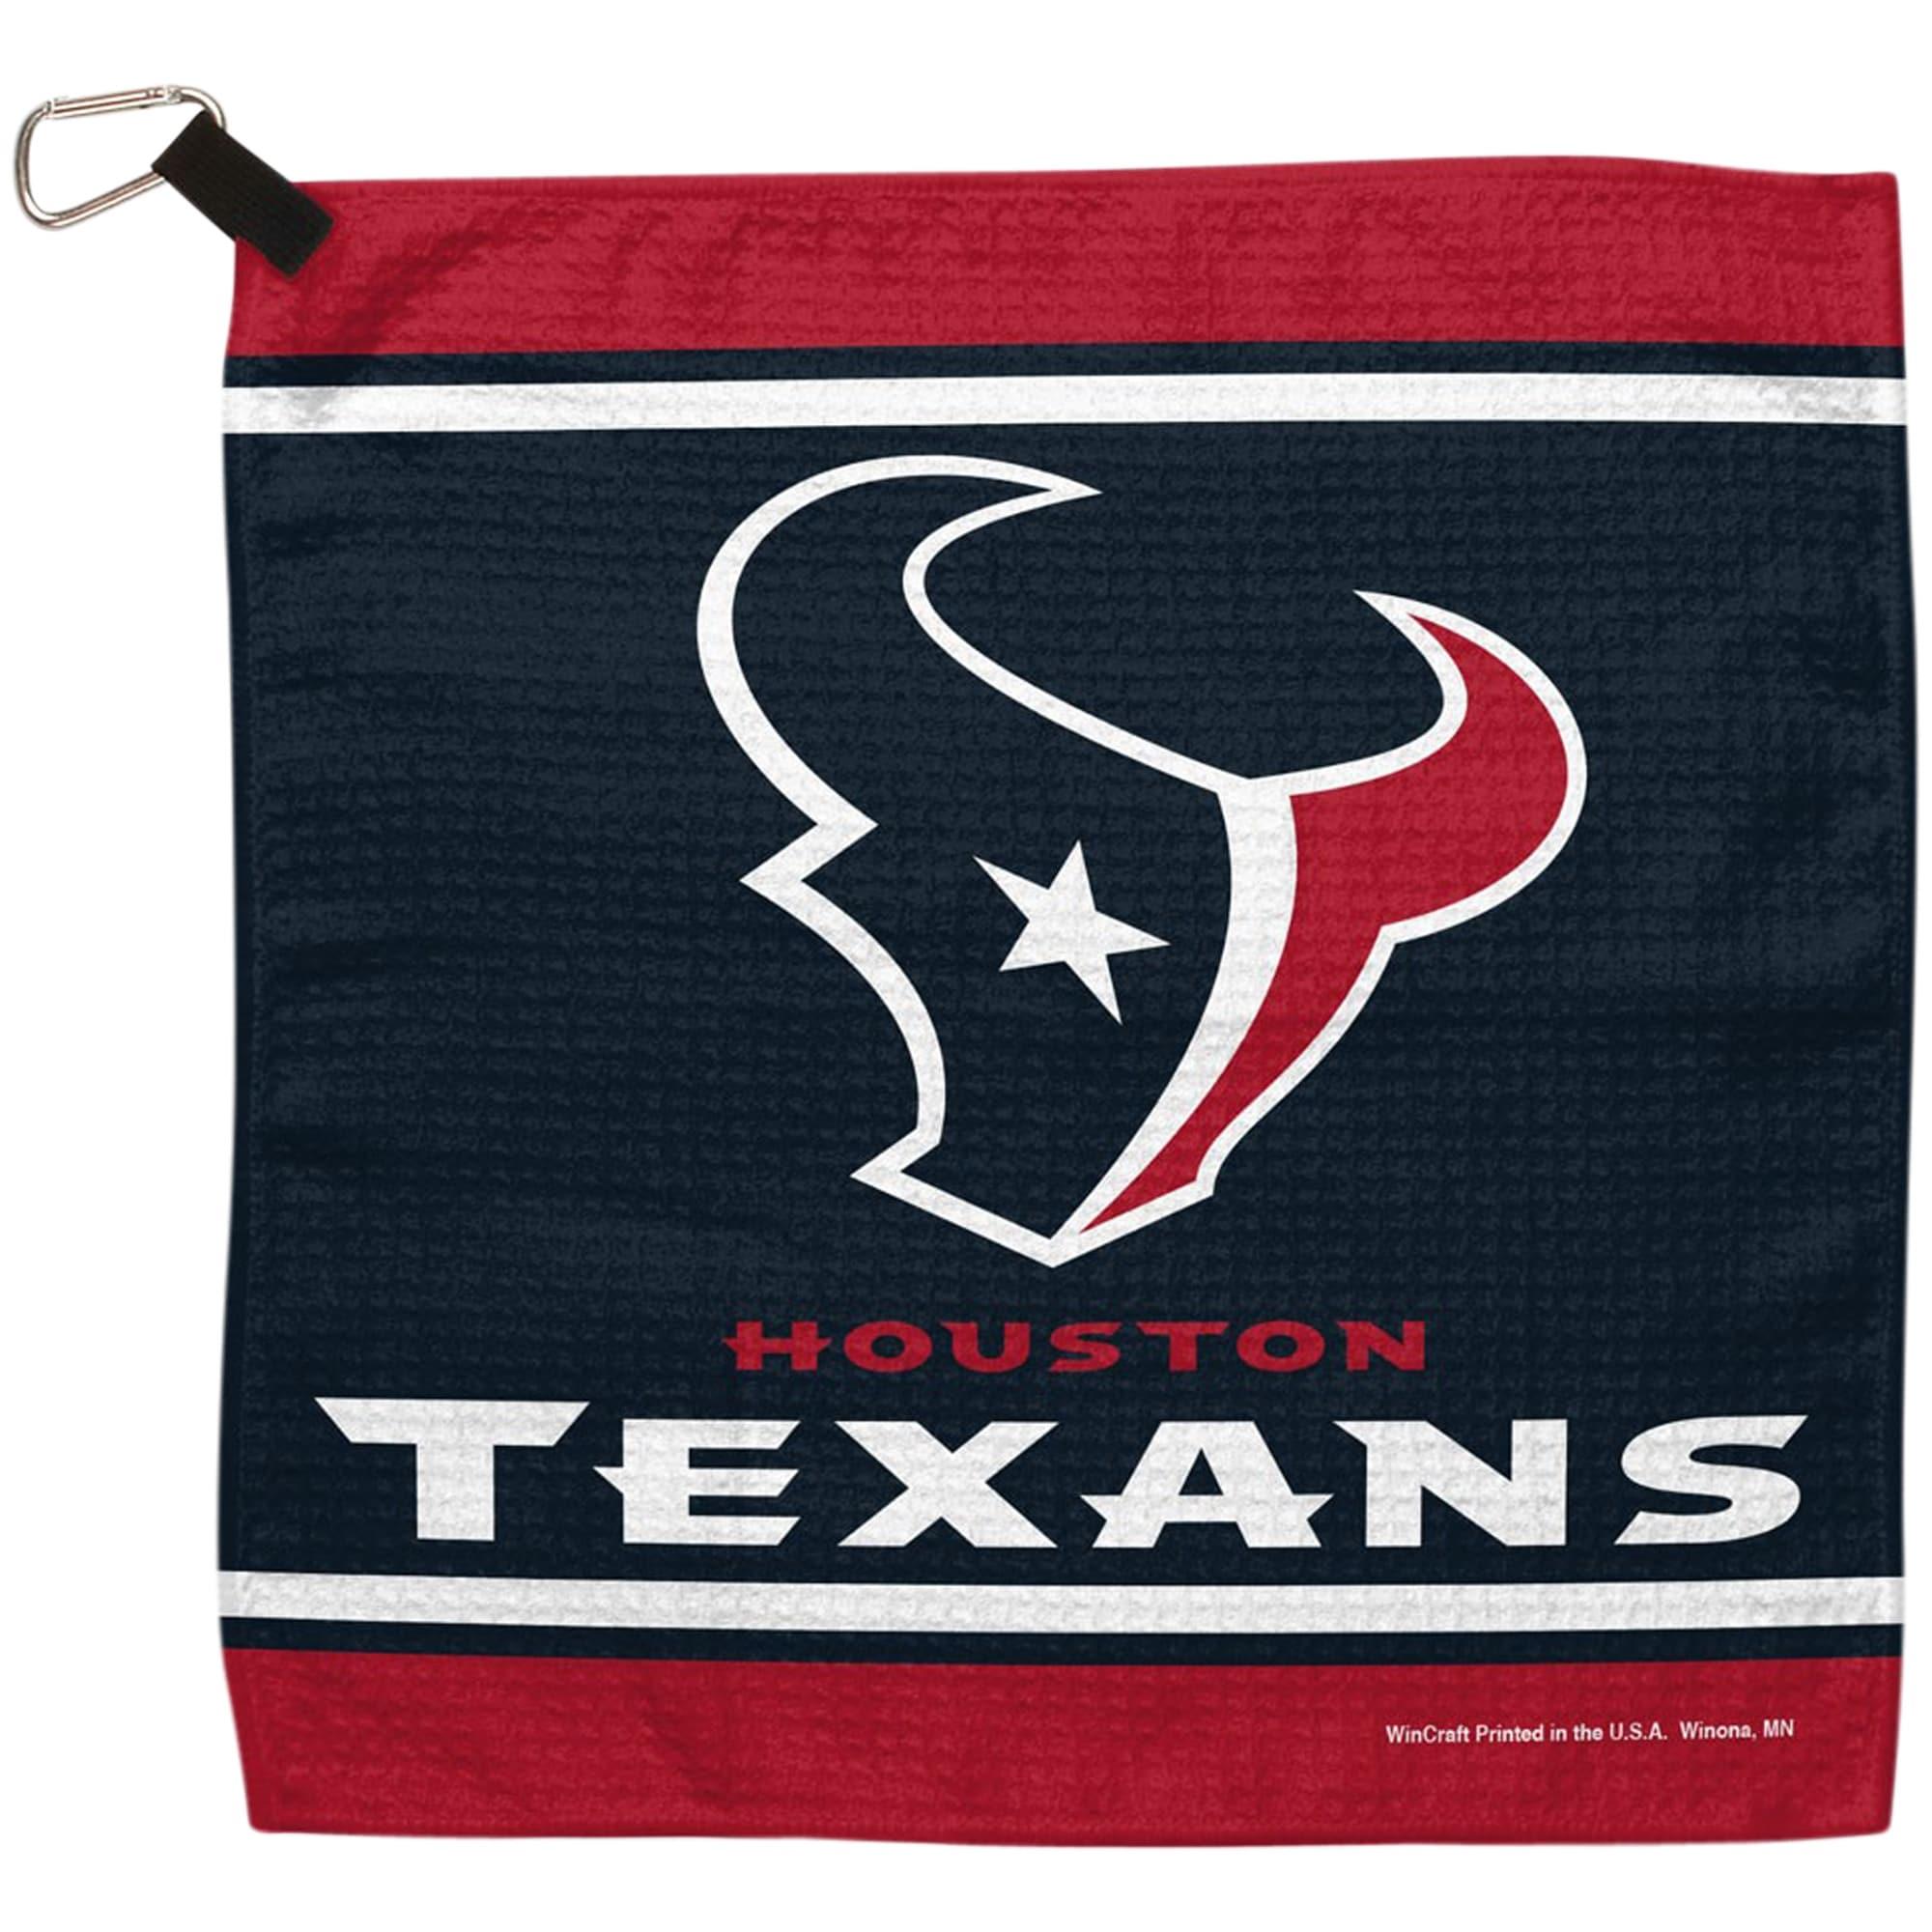 "Houston Texans WinCraft 13"" x 13"" Waffle Towel"